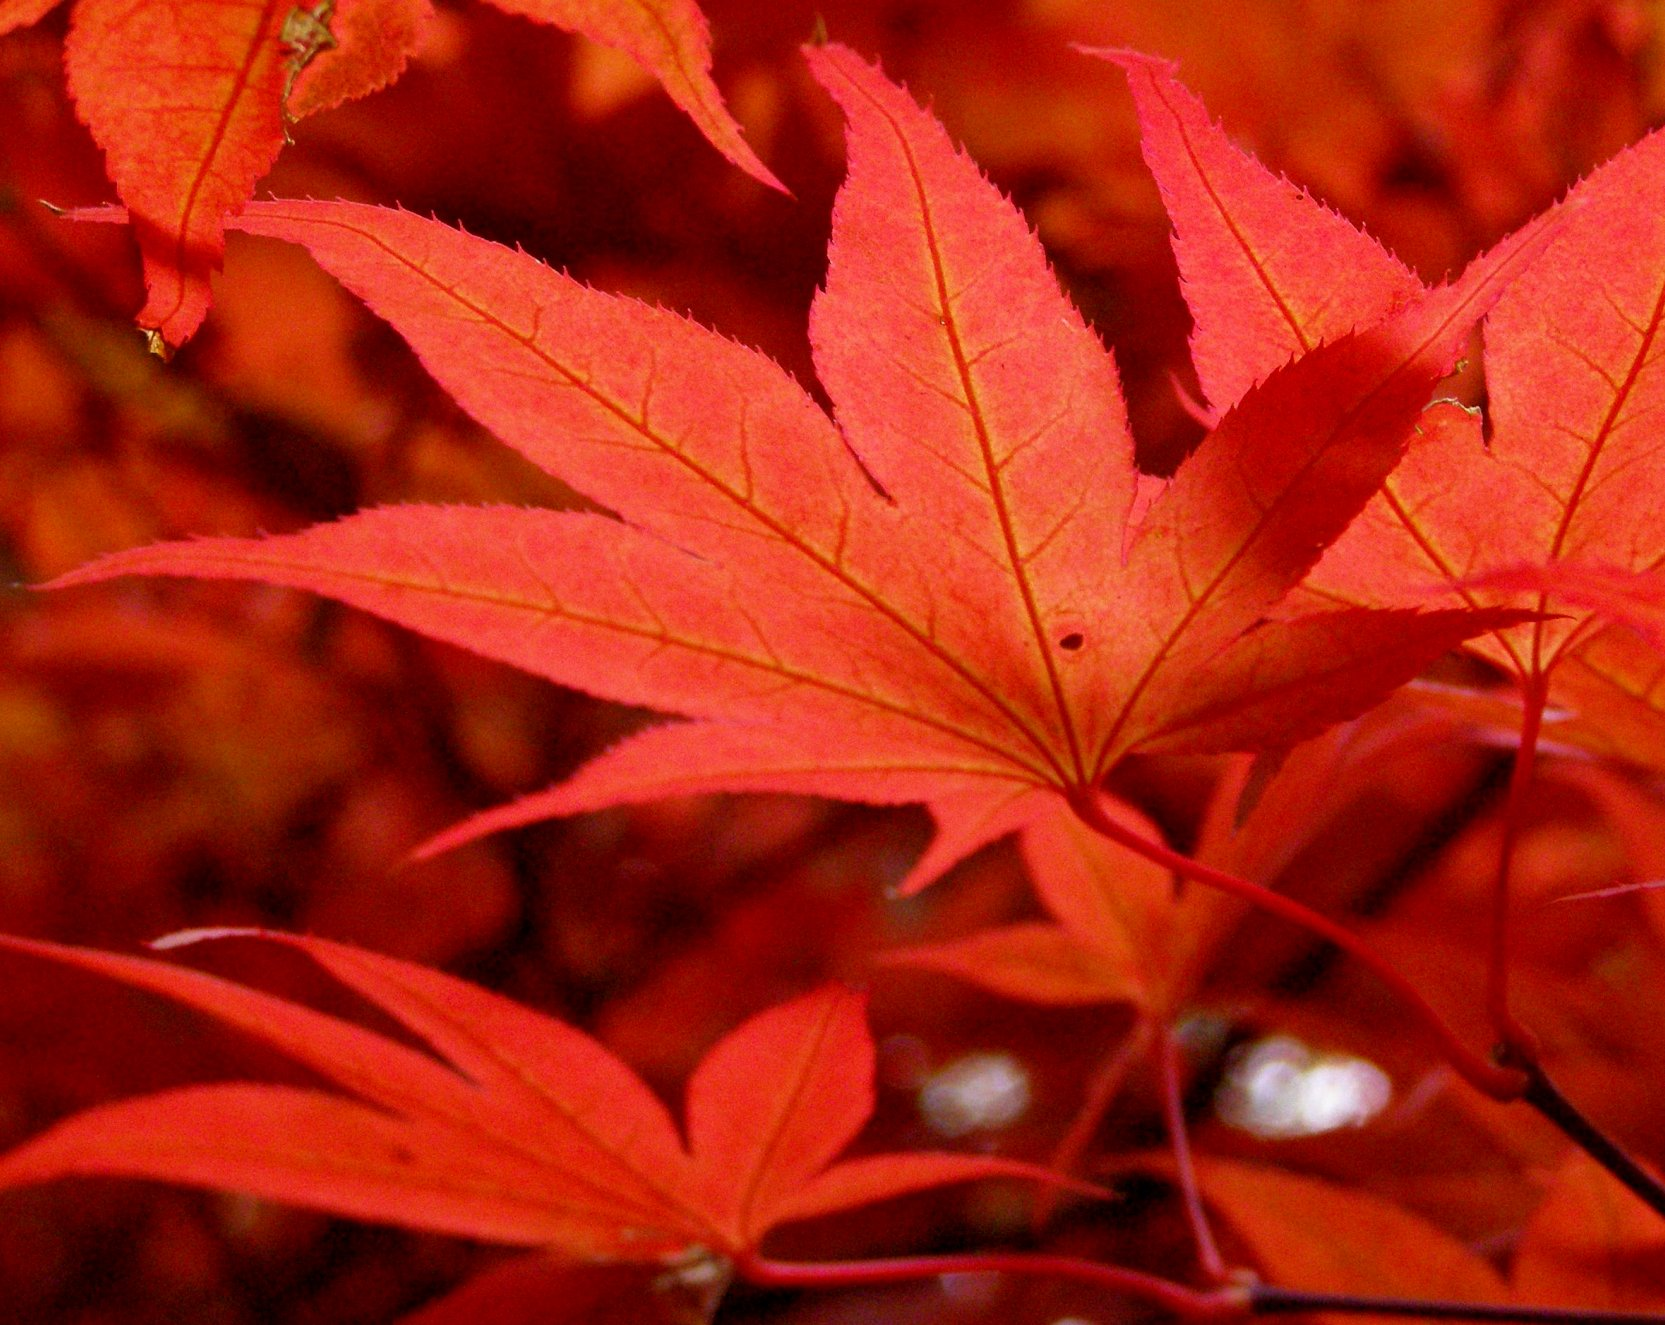 File:Maple leaves in October 2009.jpg - Wikipedia, the free ...: en.wikipedia.org/wiki/file:maple_leaves_in_october_2009.jpg